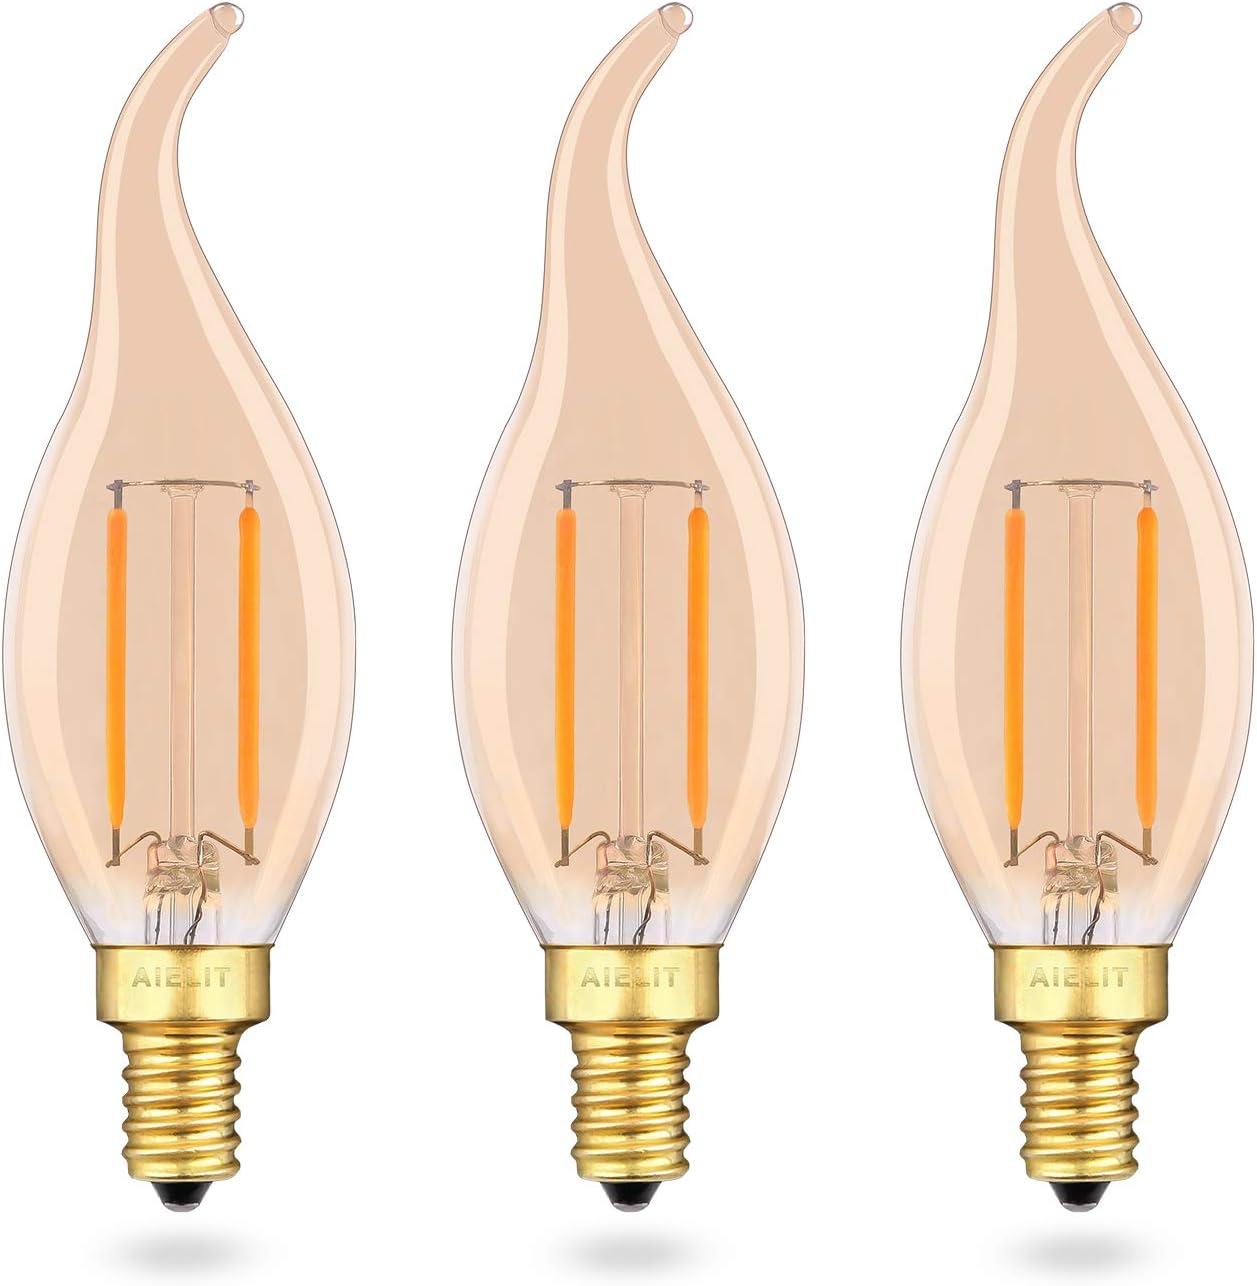 CA10 E12 Edison LED Bulb Dimmable, 2W(25-Watt Equivalent), Warm White 2700K, Amber Glass,200 Lumens, AIELIT CA10 LED Candelabra Light Bulbs for Pendant Chandelier Hanging Lamp Home, 3-Pack